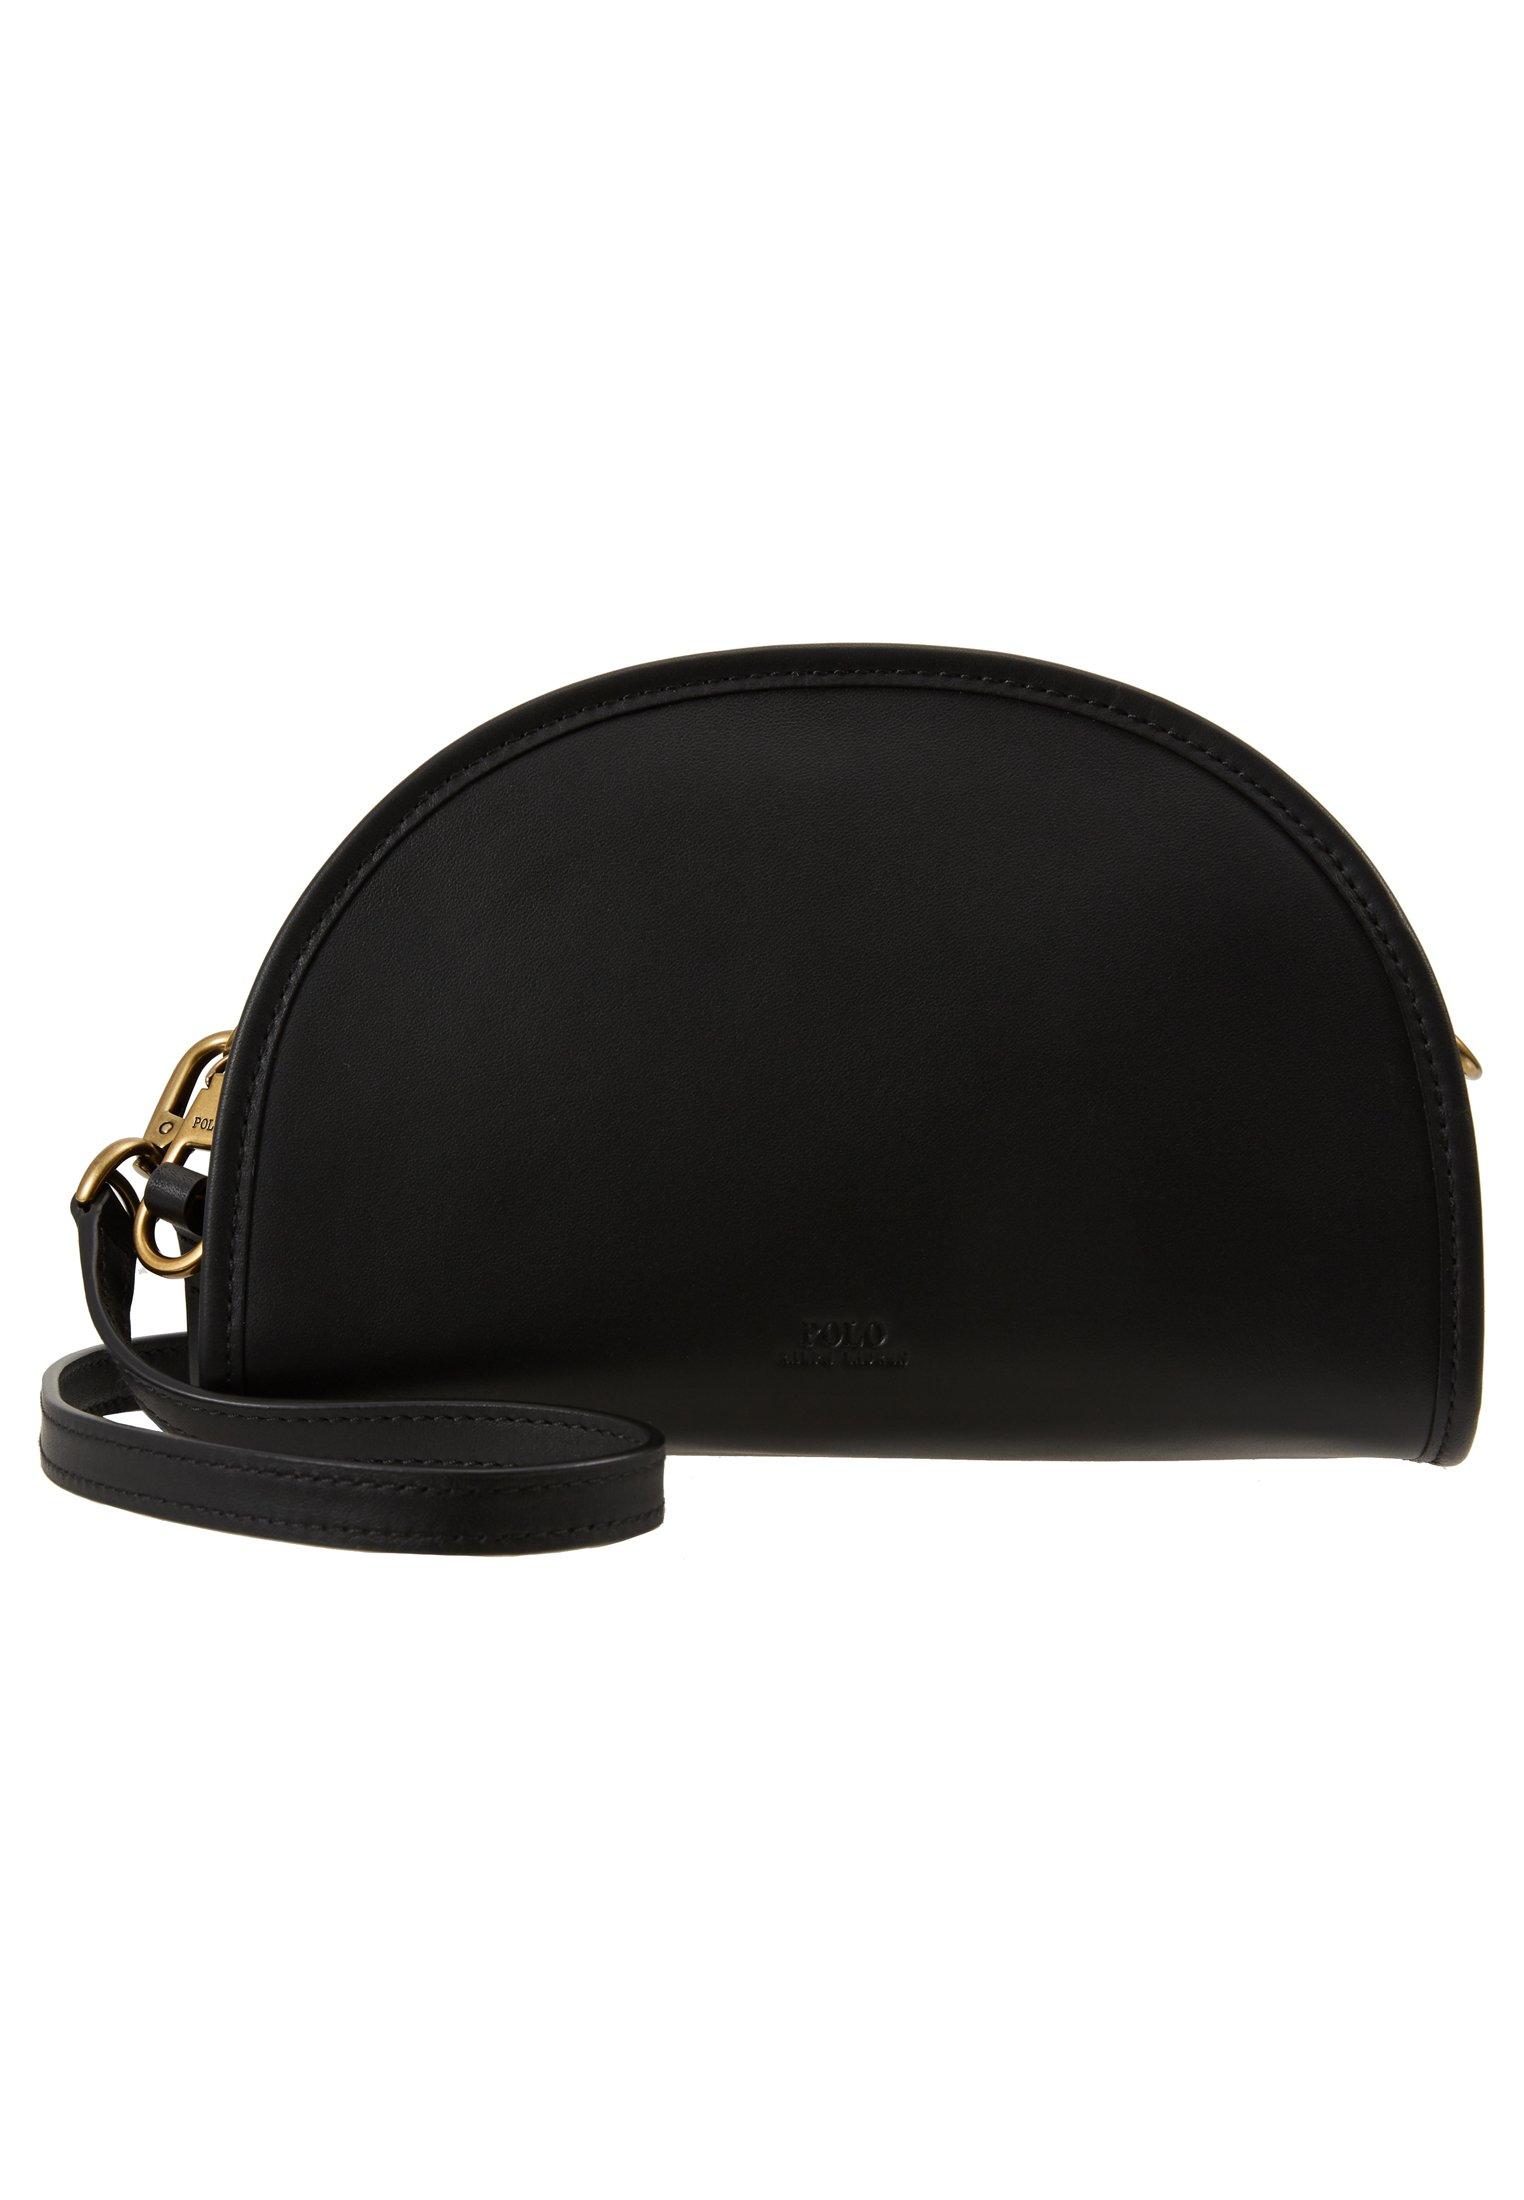 Polo Ralph Lauren HALF MOON - Umhängetasche - black - Black Friday